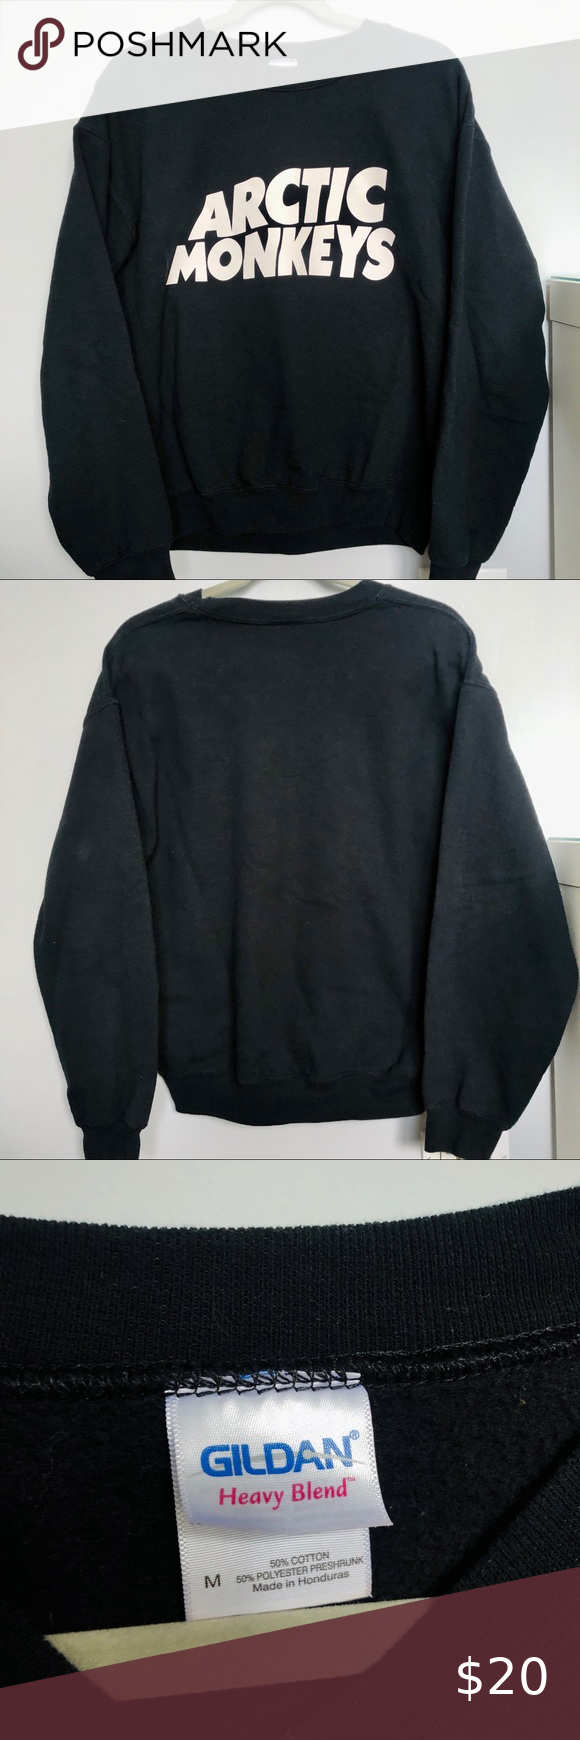 Arctic Monkeys Black Crewneck Sweatshirt Black Crewneck Sweatshirt Crew Neck Sweatshirt Sweatshirts [ 1740 x 580 Pixel ]